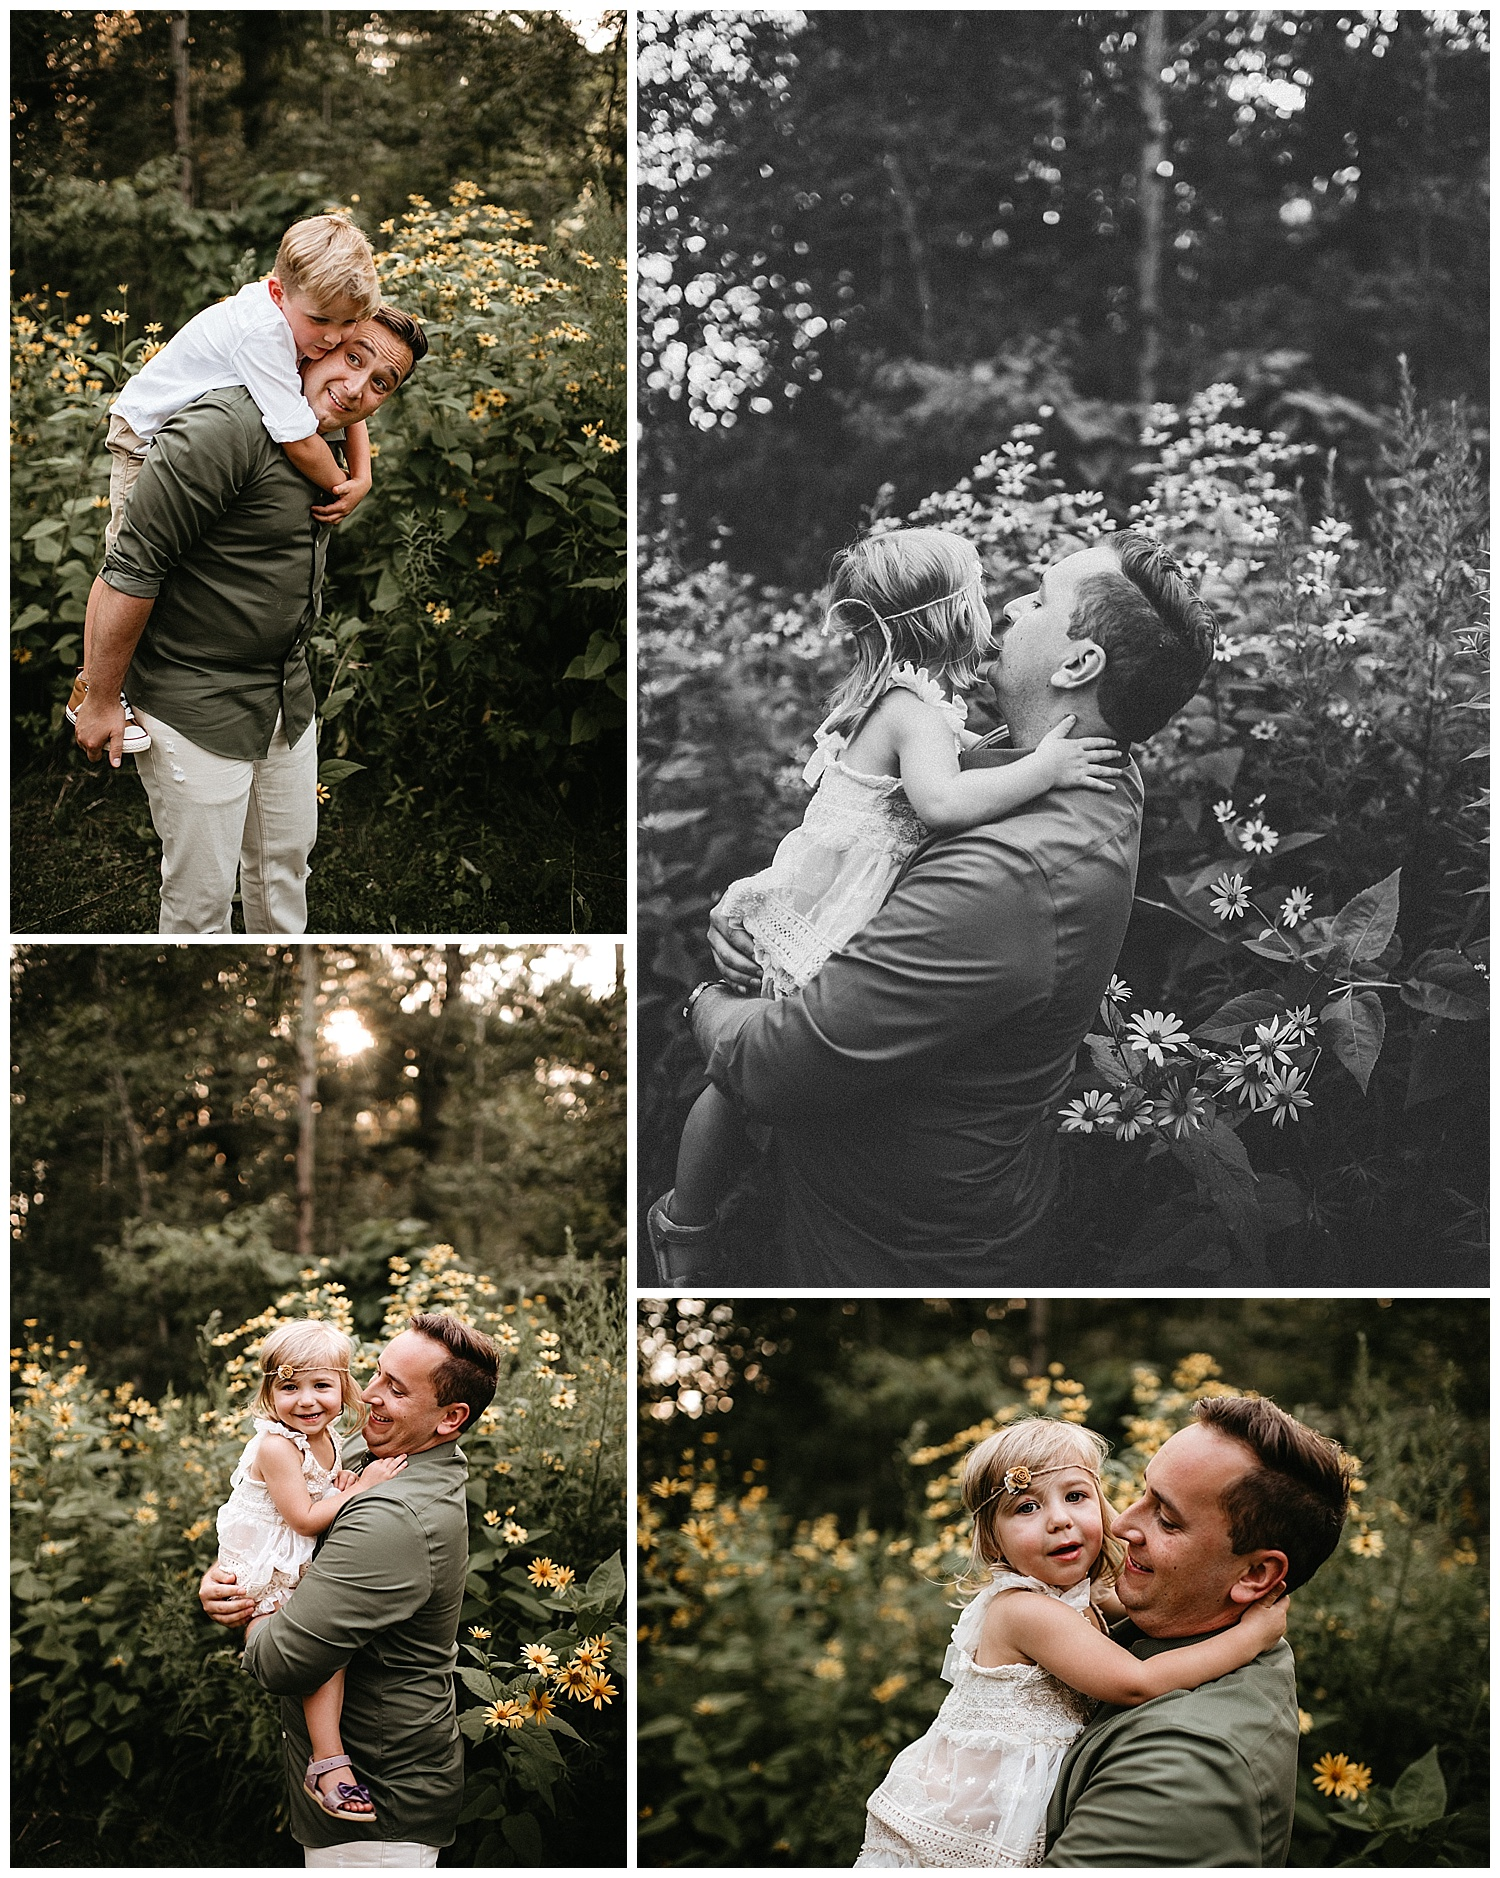 NEPA-Family-Photographer-in-Wilkes-Barre-PA_0157.jpg